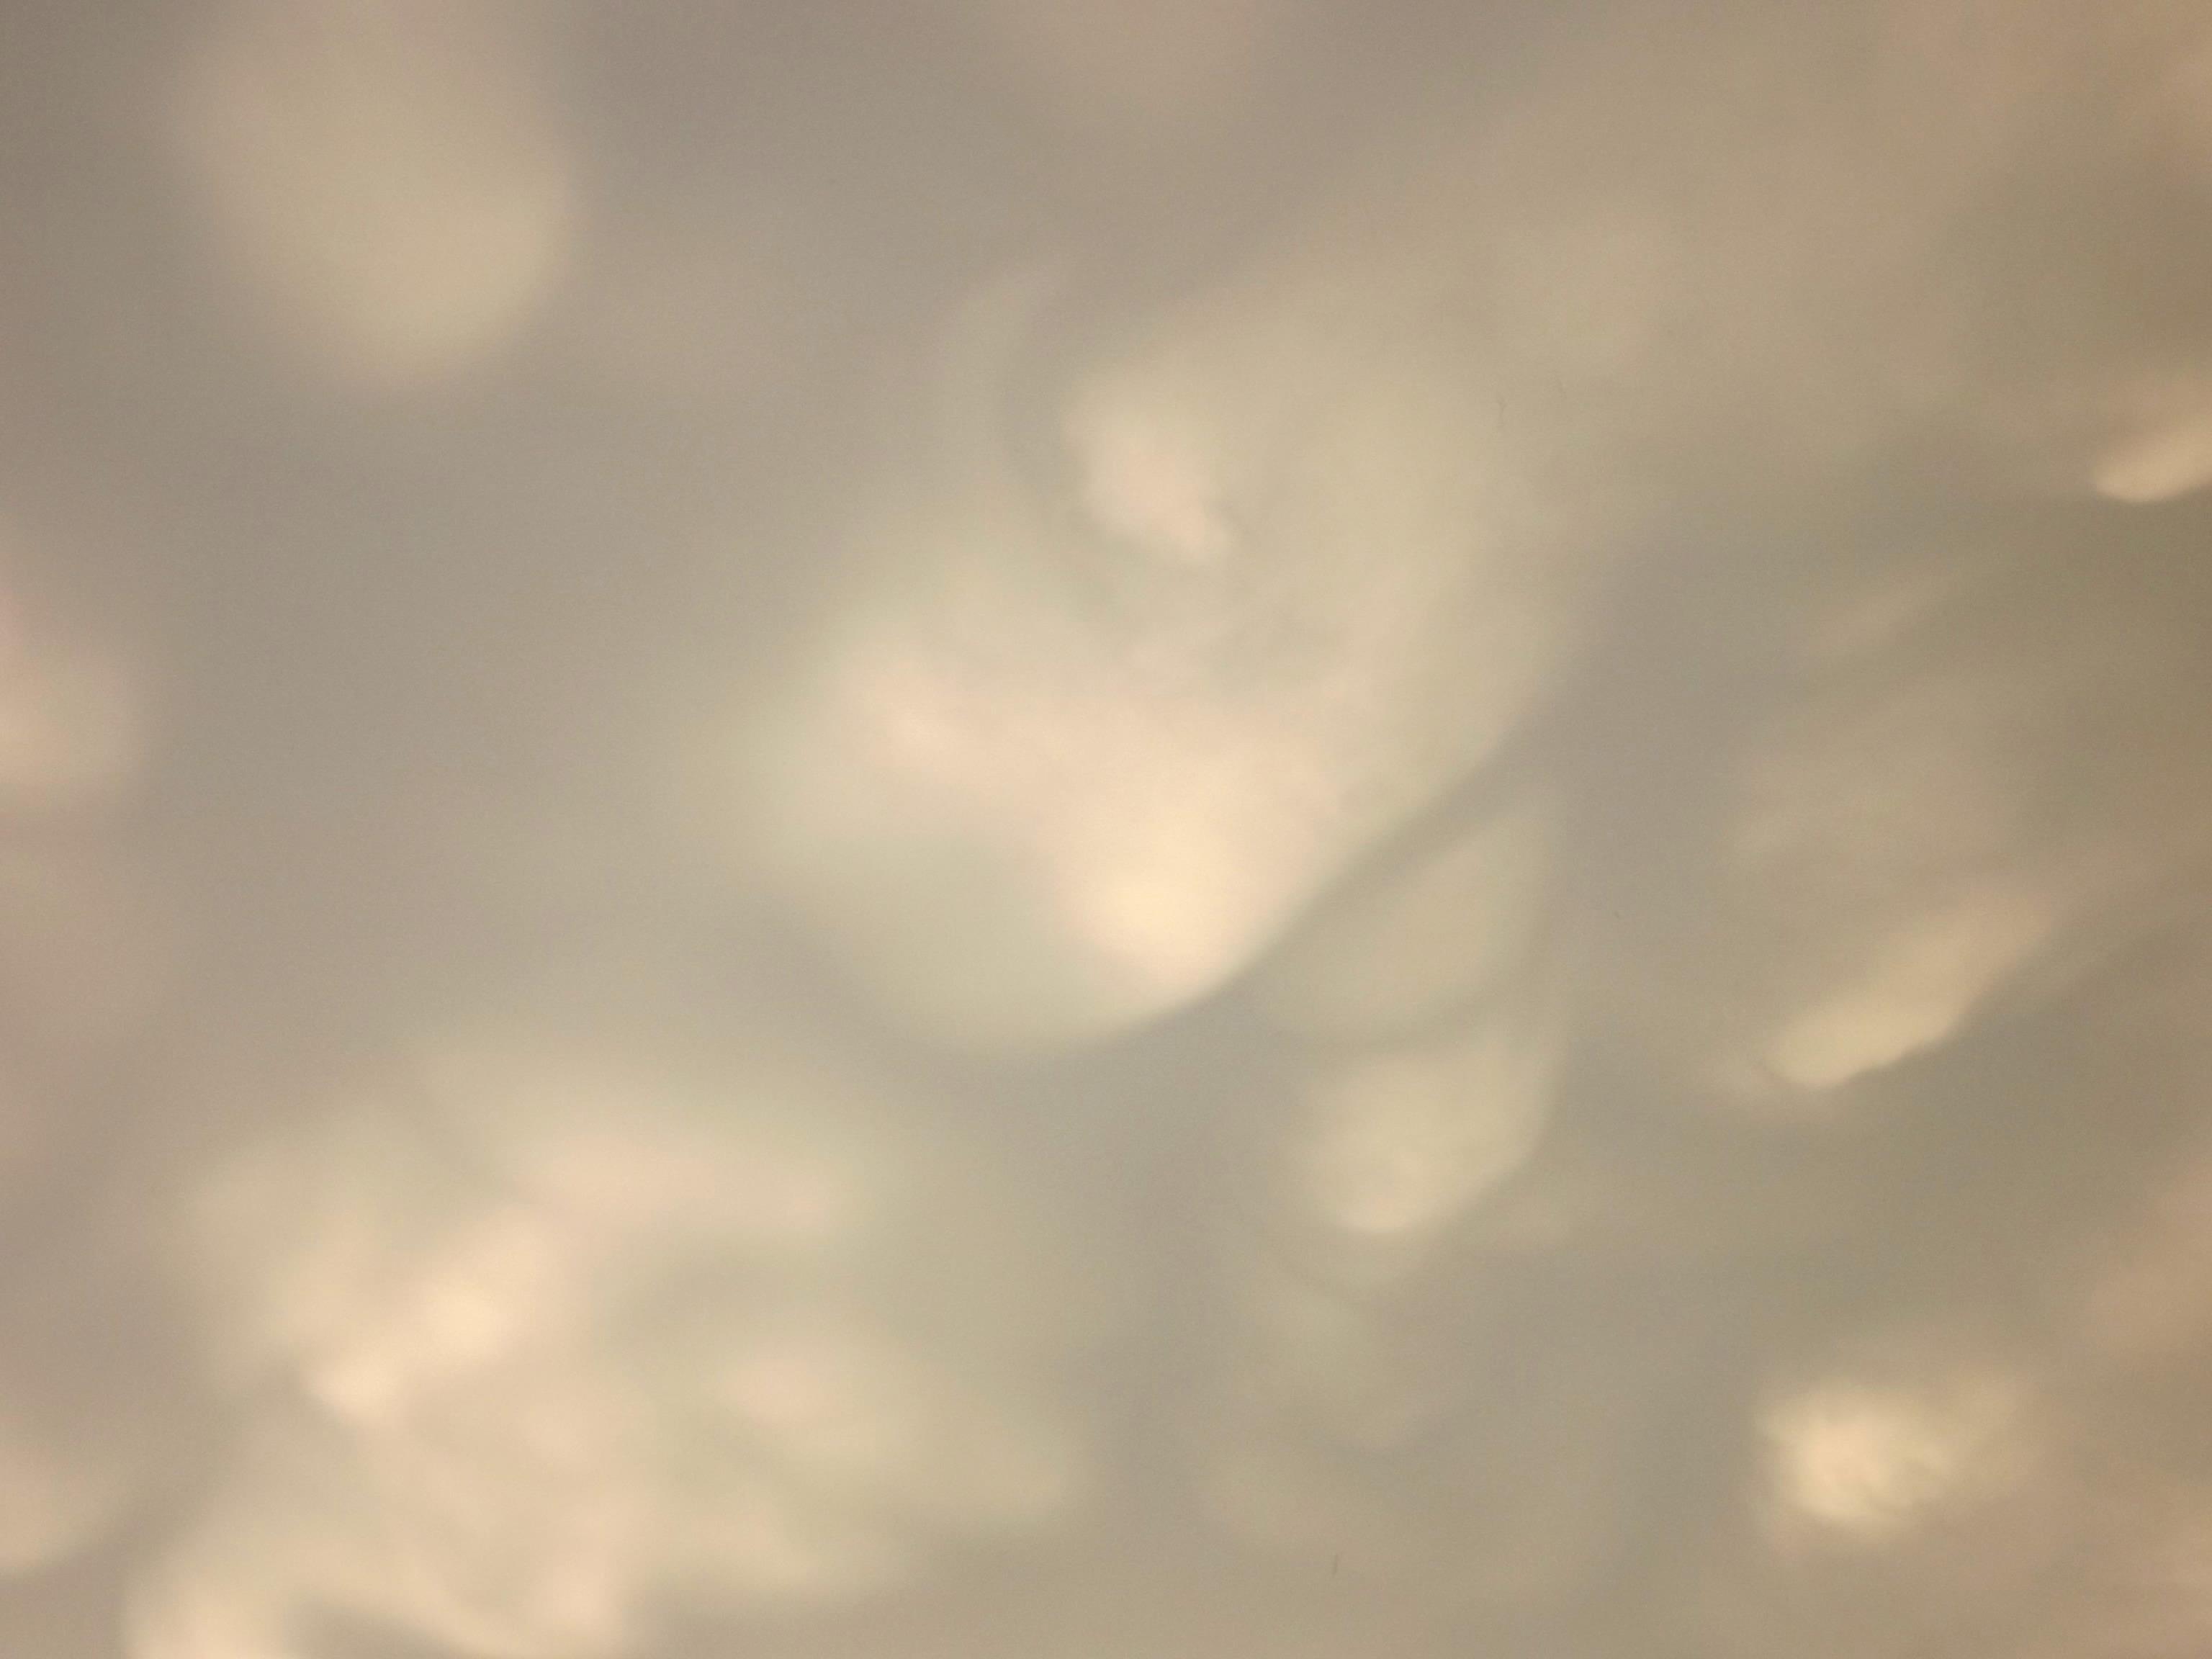 6250-himmel-wolken-zuckerwatte